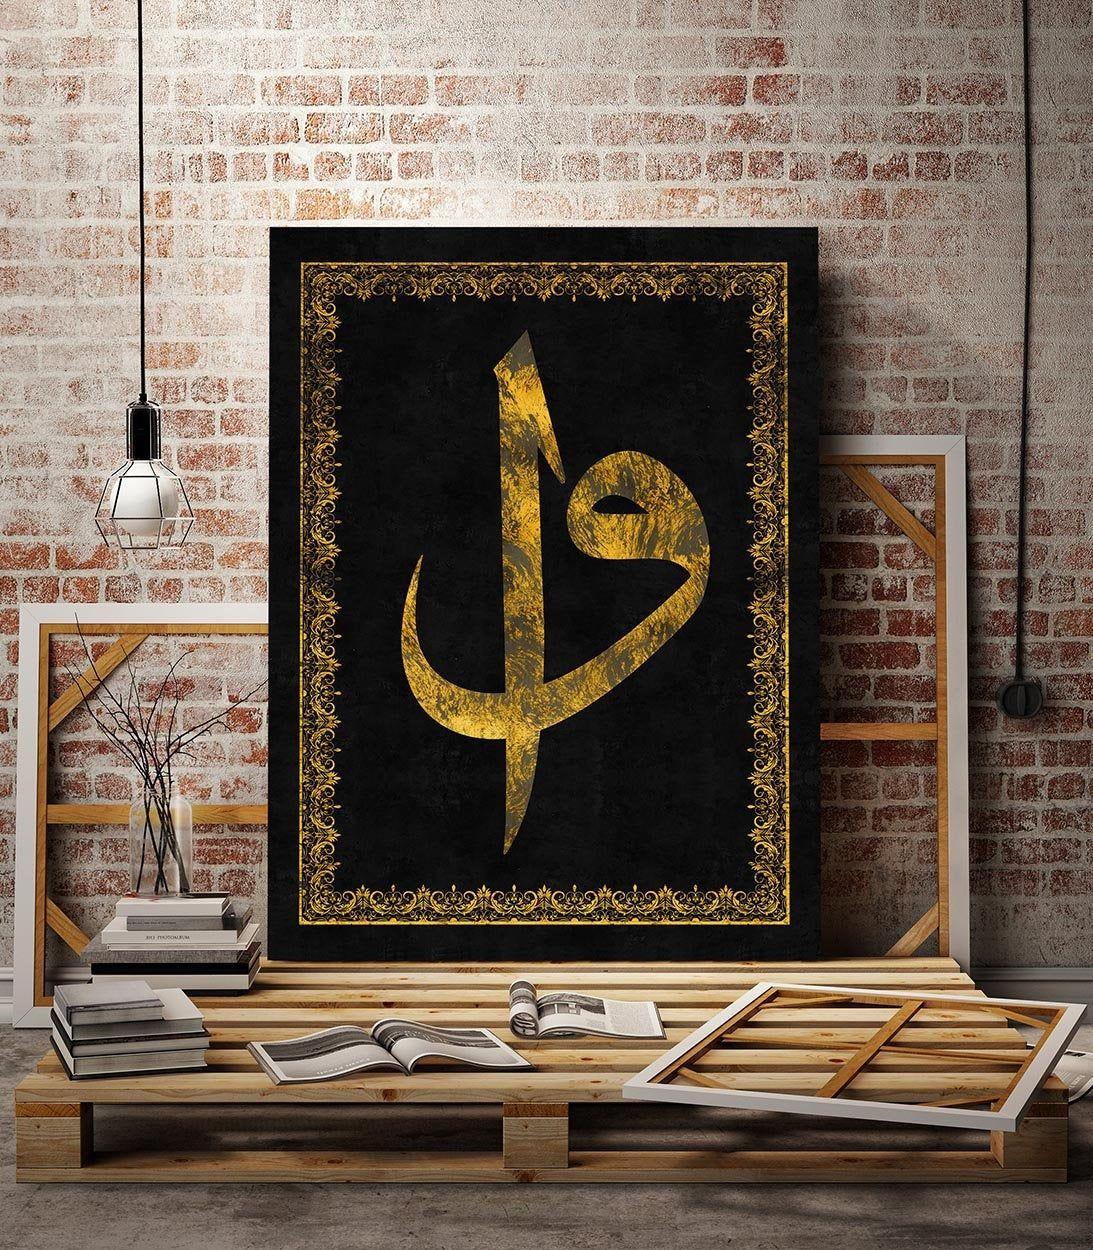 Muslim Symbol Islamic Home Gift Brown Elif wall decor Islamic Design Canvas Painting Arabic letter Islamic wall art,Unique Canvas Print